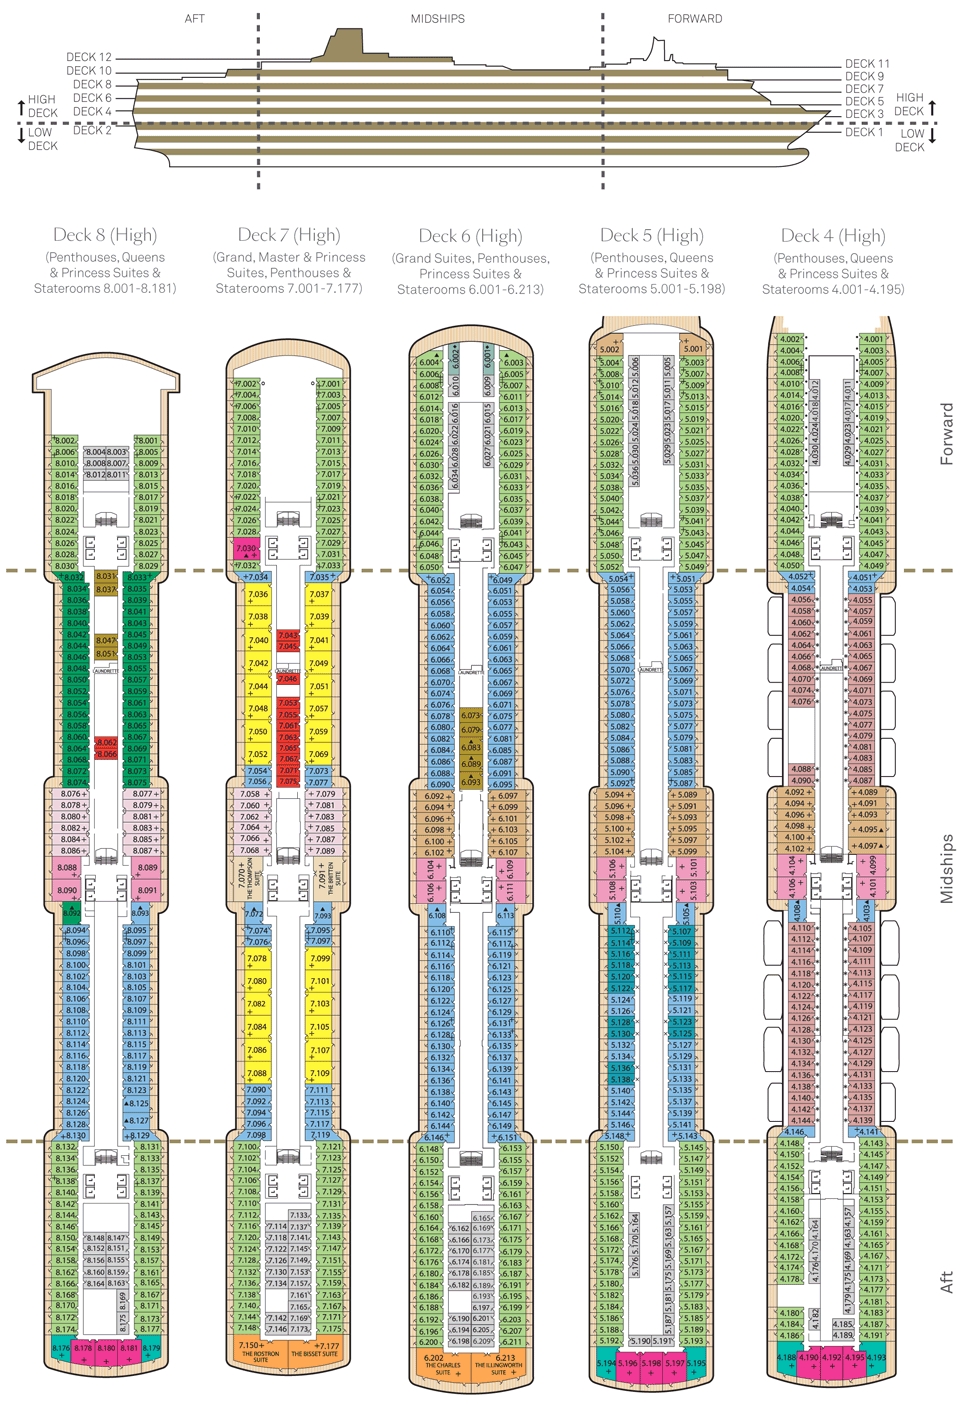 Queen mary 2 deck plan 2016 image information queen mary 2 deck plan 2016 baanklon Gallery